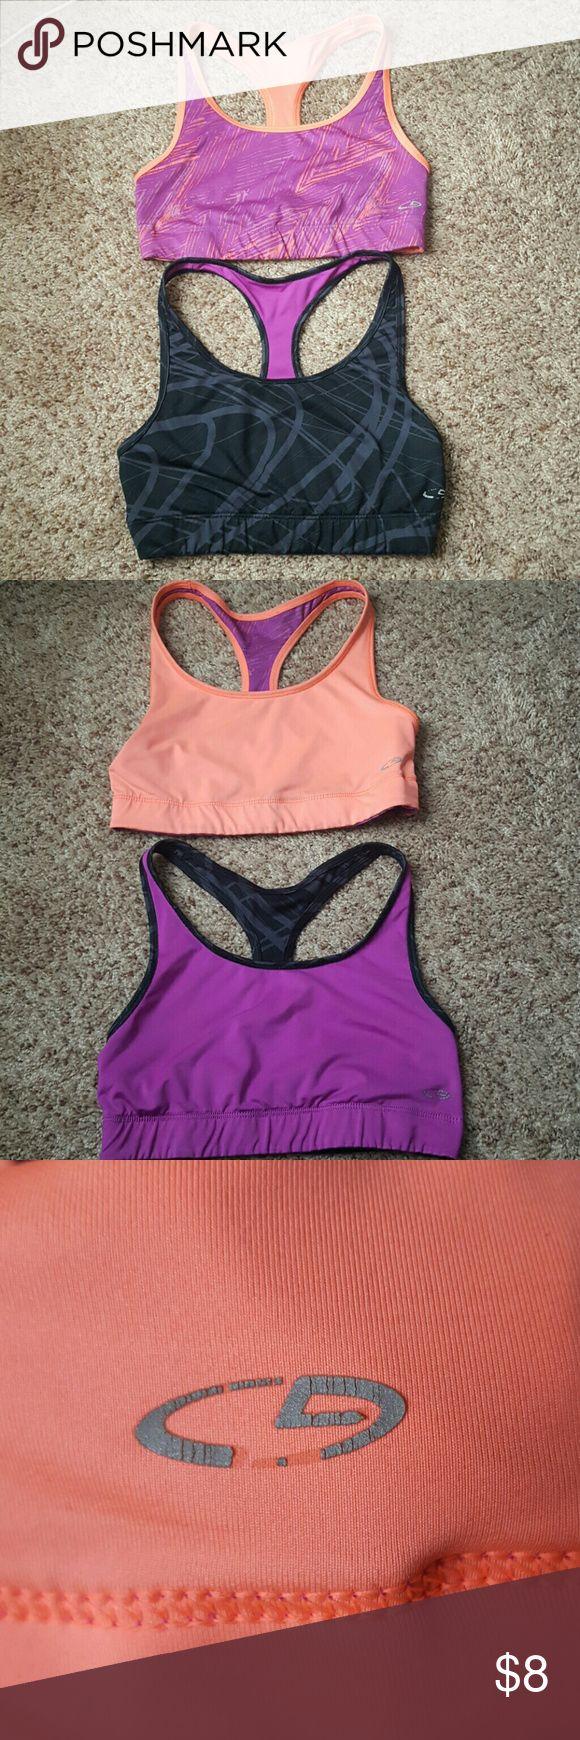 Two reversible sport bras Two reversible Champion sports bras. Gently used. Champion logo is slightly peeling. Champion Intimates & Sleepwear Bras